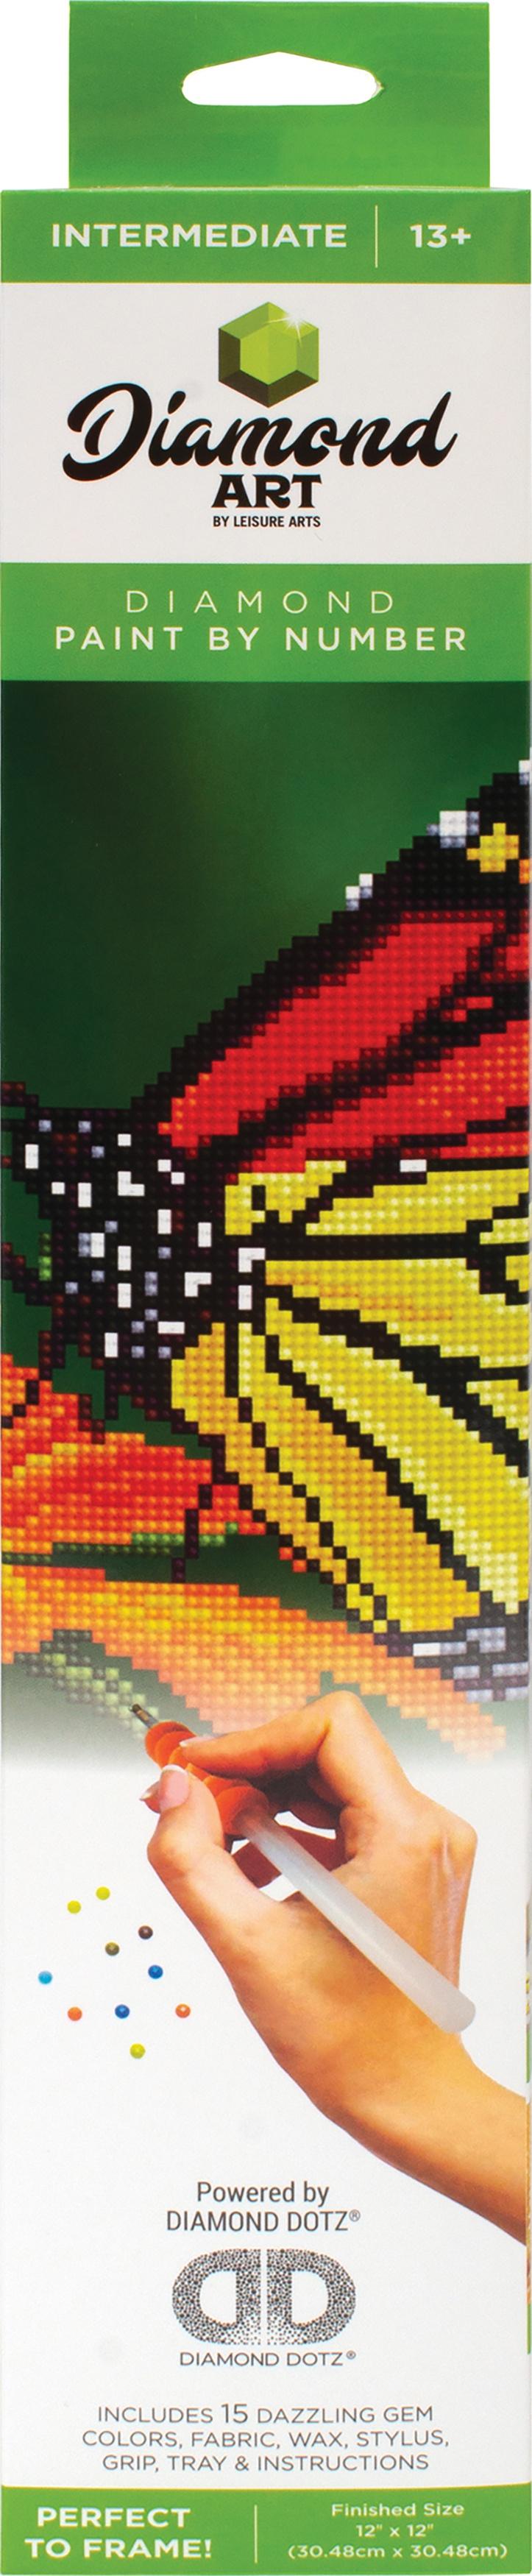 Diamond Art Kit 12x12 Intermediate Monarch